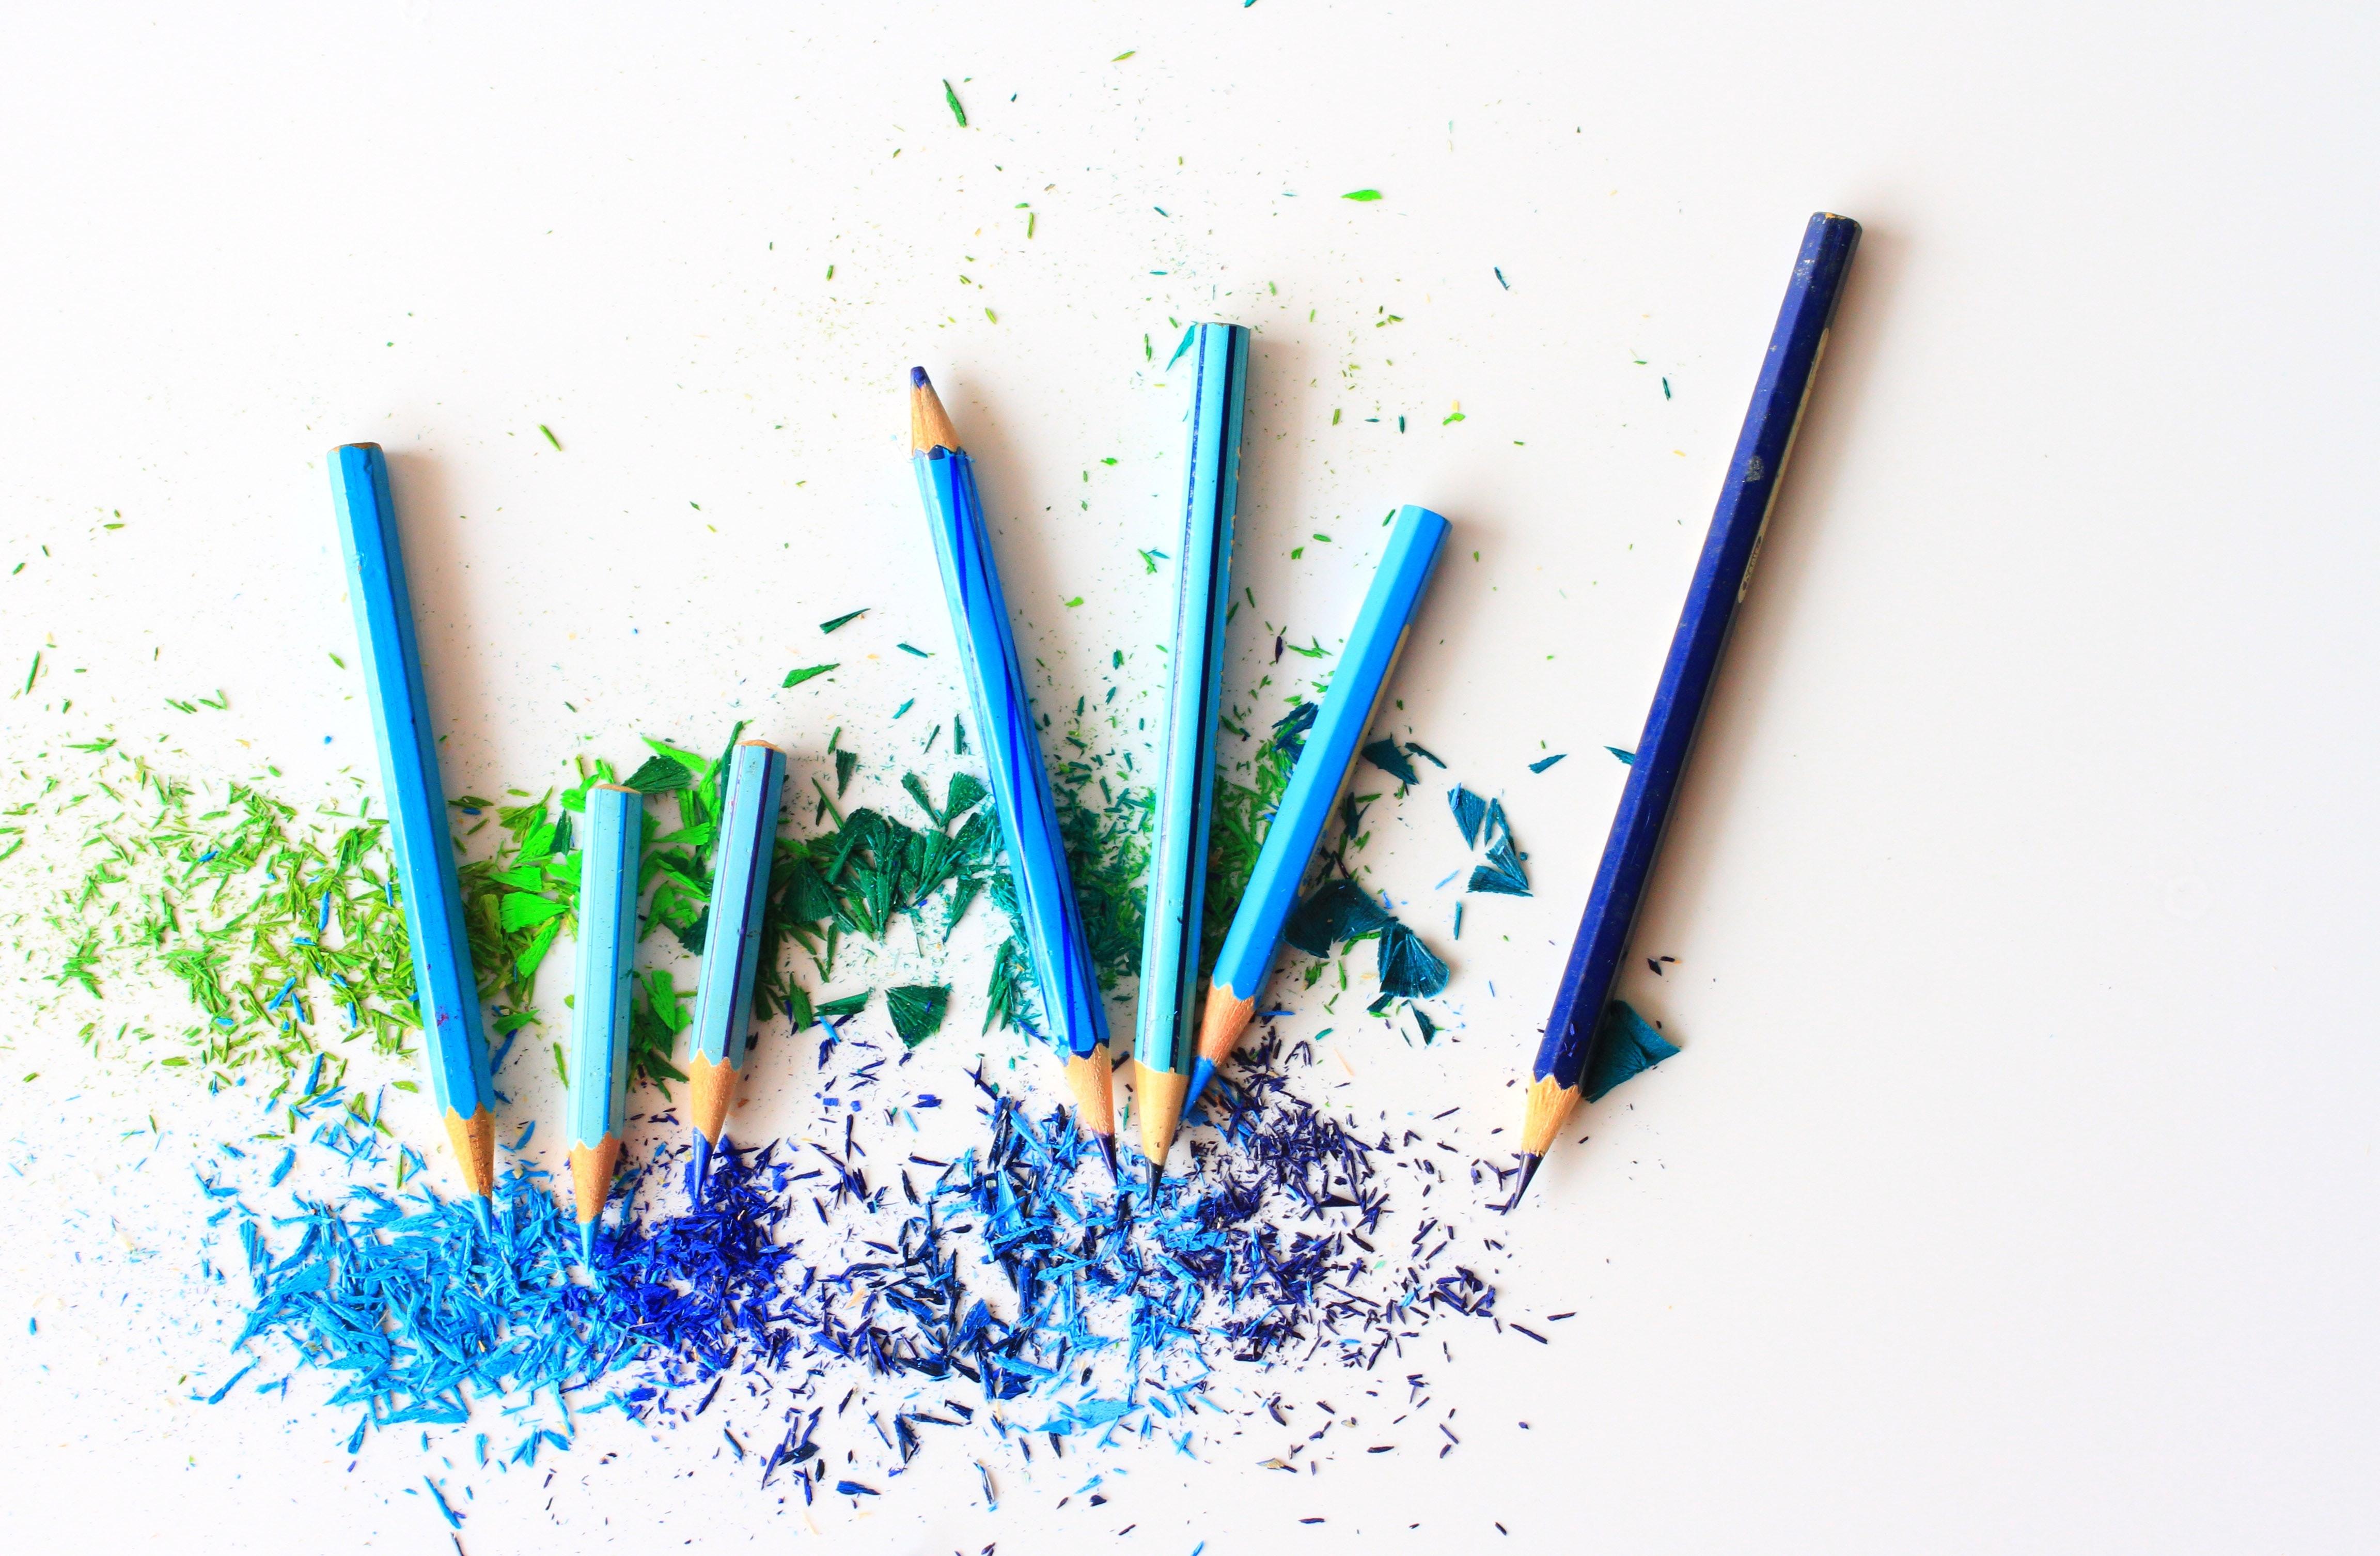 Blue and purple color pencils photo